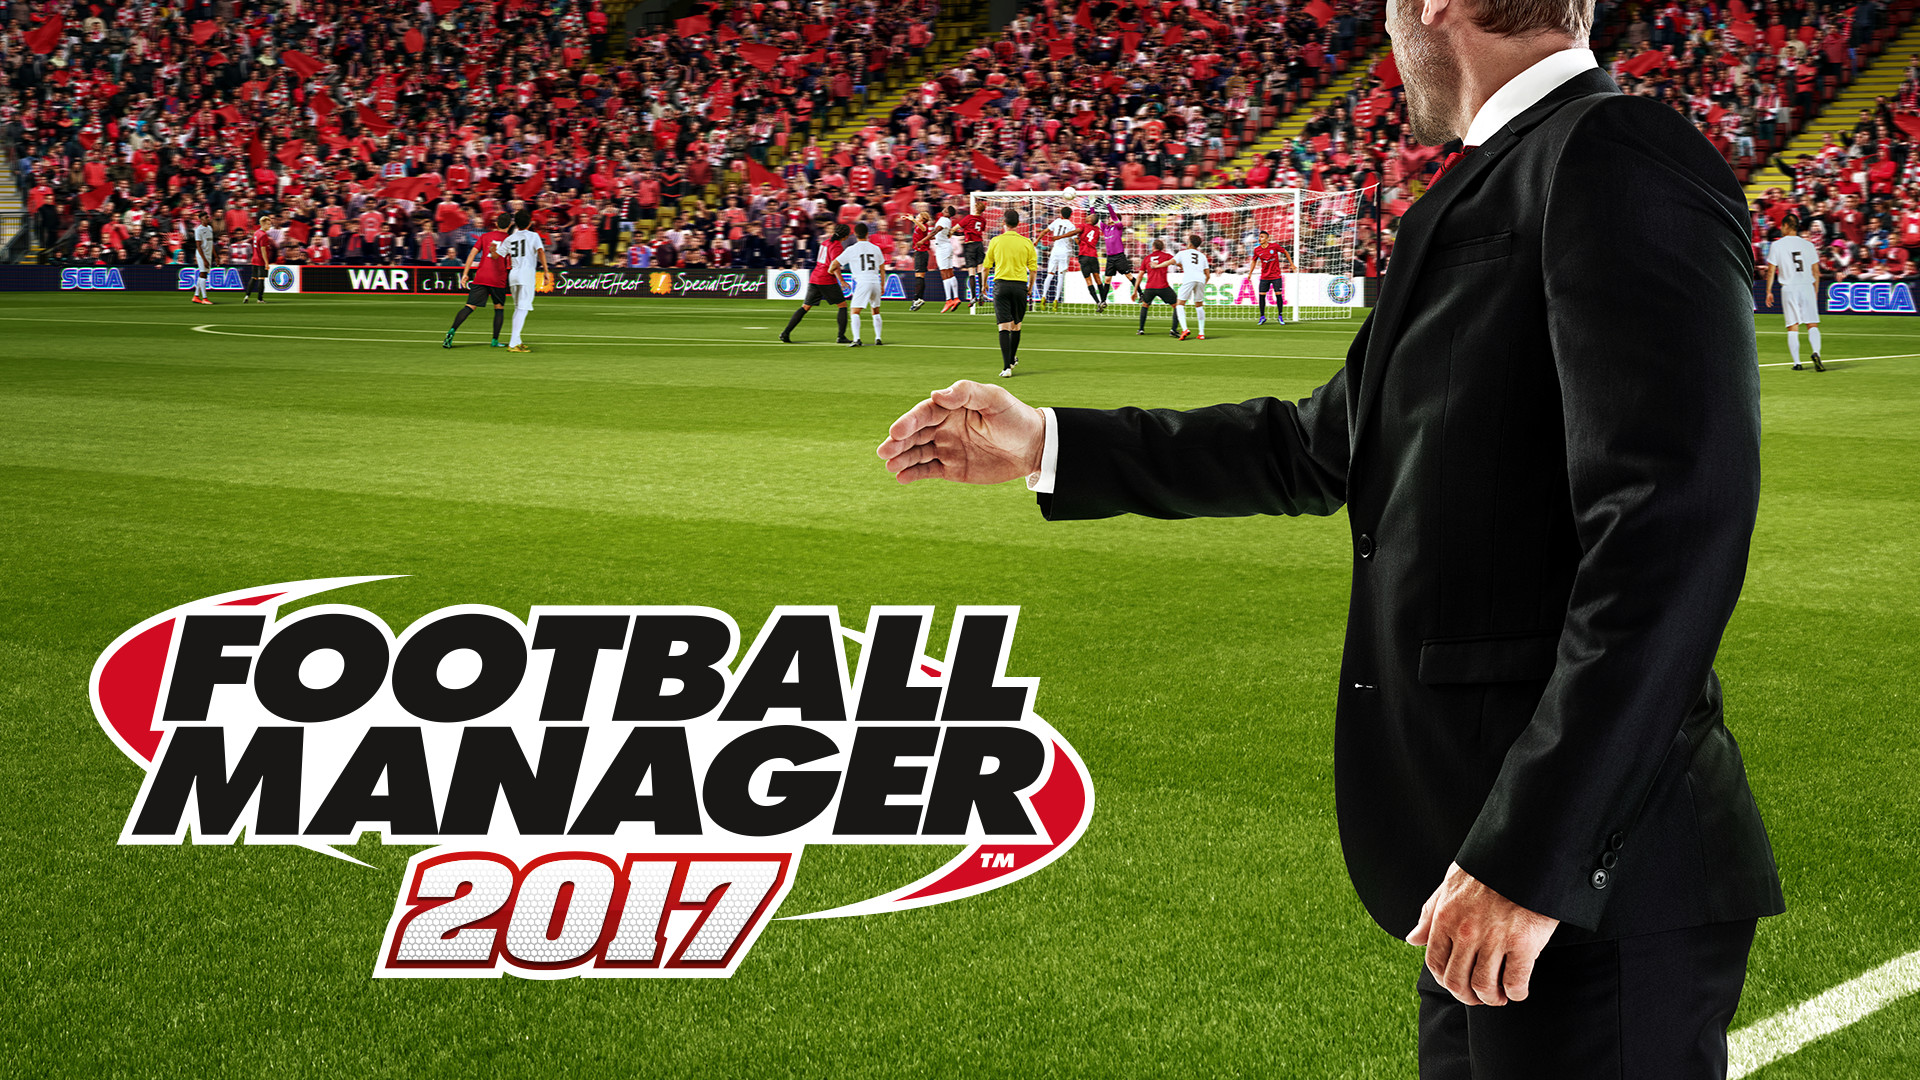 Football Manager 2017 dorazí 4. listopadu 128793